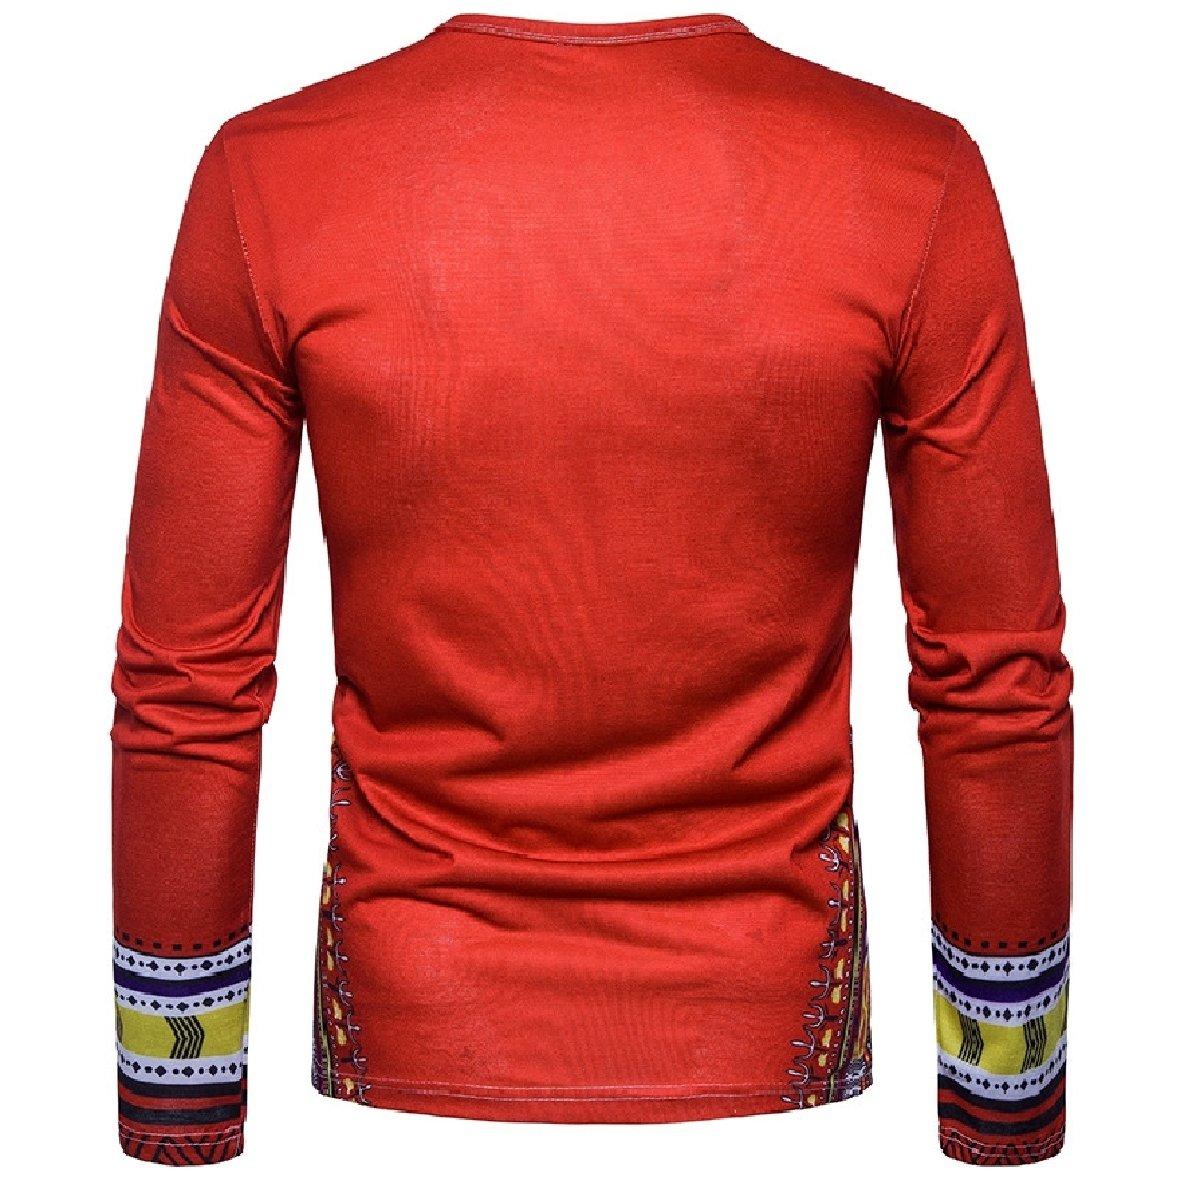 RDHOPE-Men Dashiki Fashion Crew Neck African Style T-Shirt Top Tees